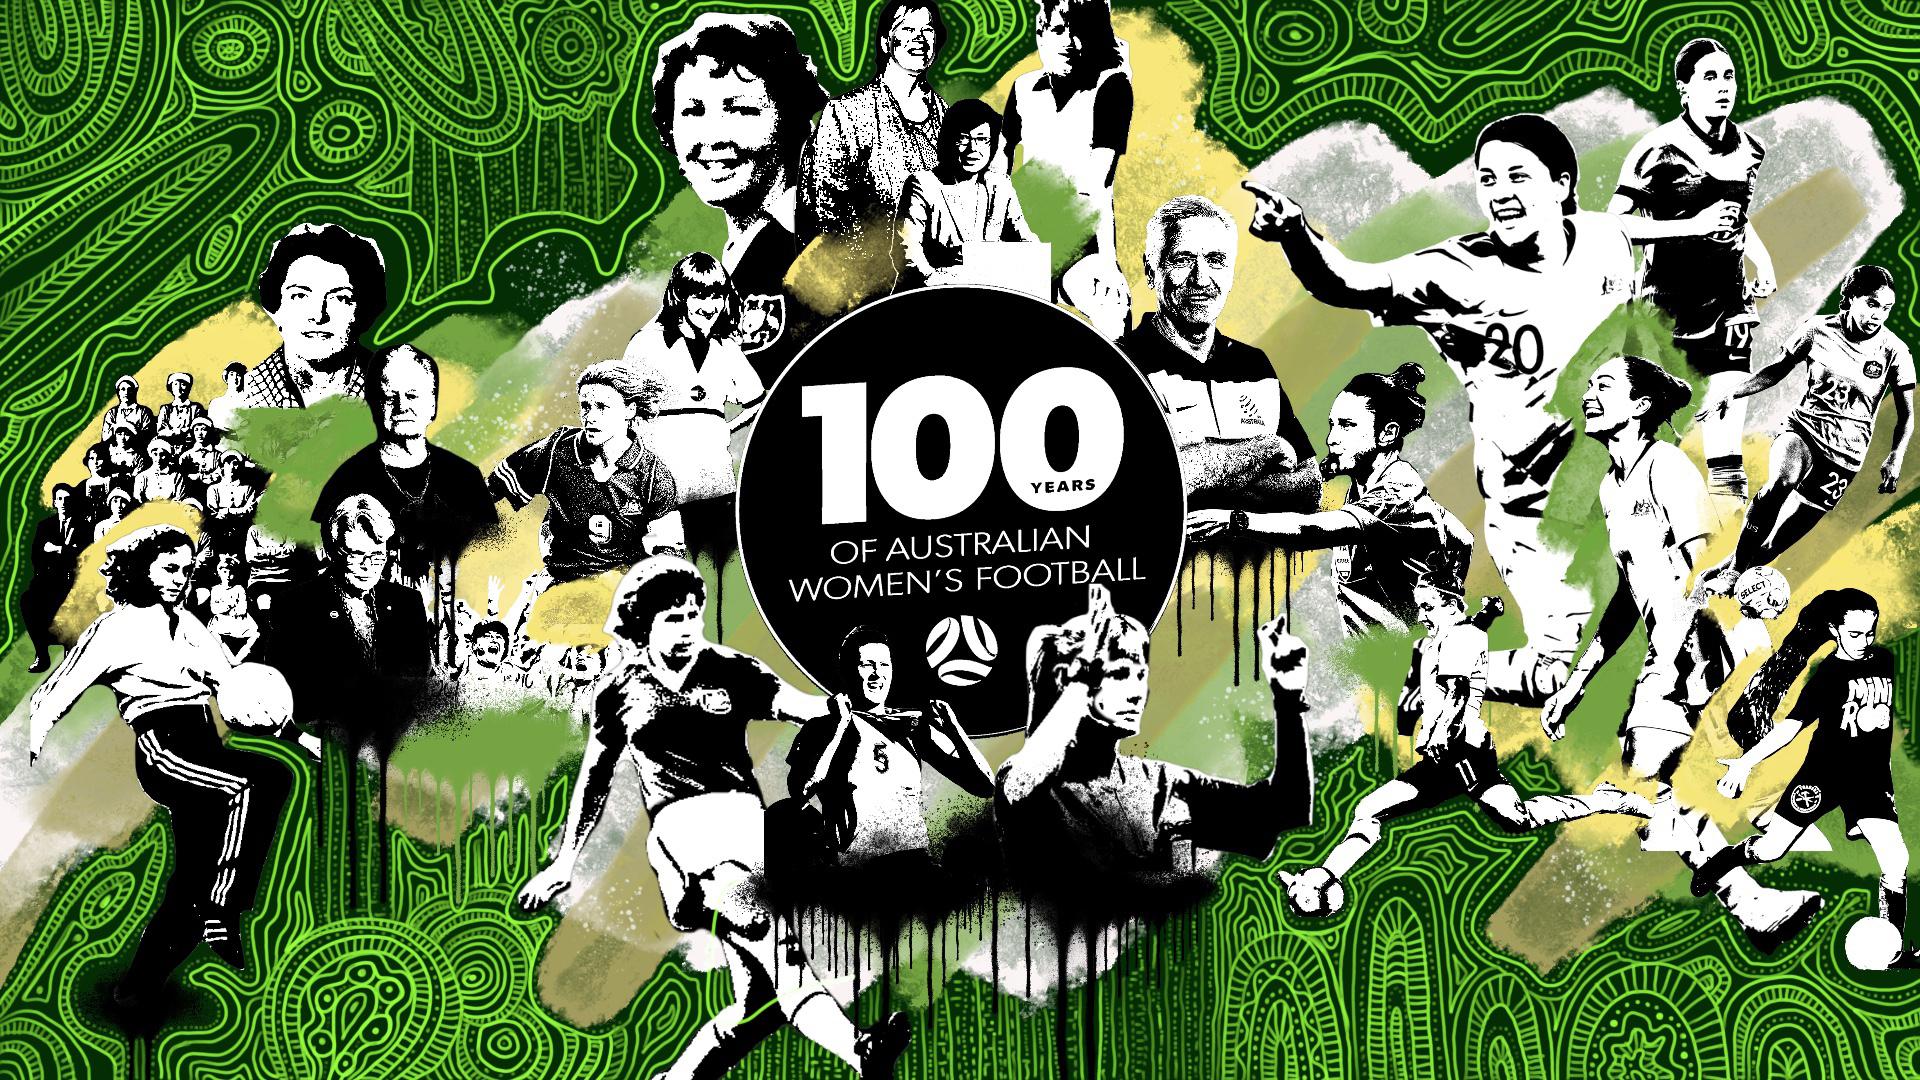 100 years of women's football digital wall mural